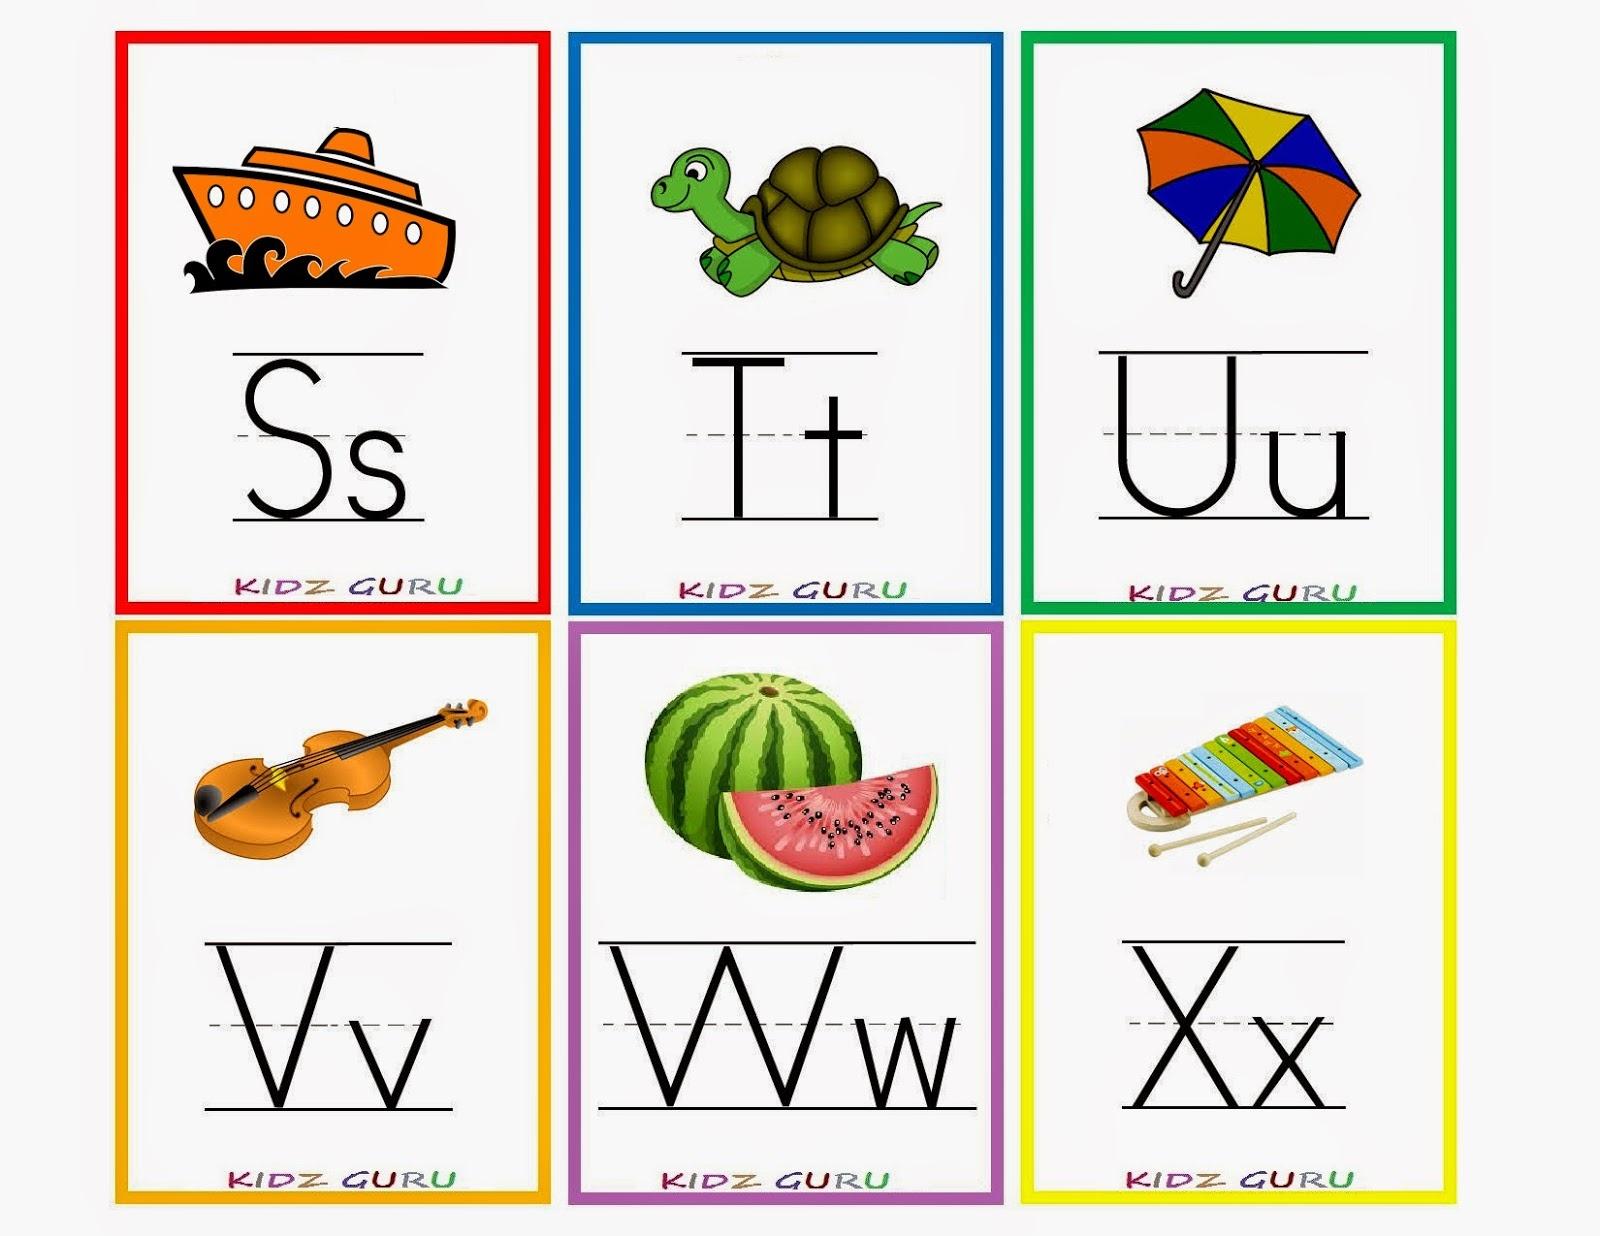 Kindergarten Worksheets: Printable Worksheets - Alphabet Flash Cards 4 - Free Printable Alphabet Cards With Pictures